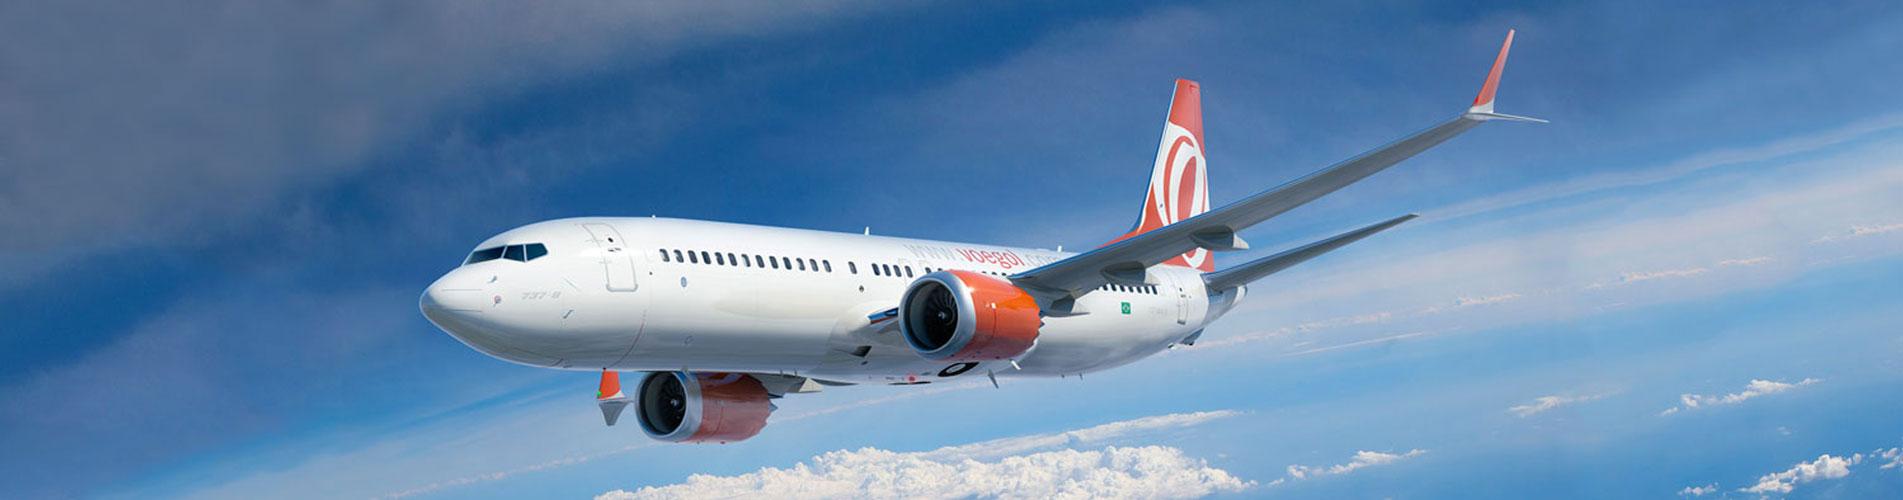 Brazil Lifts Boeing 737 MAX Flight Ban